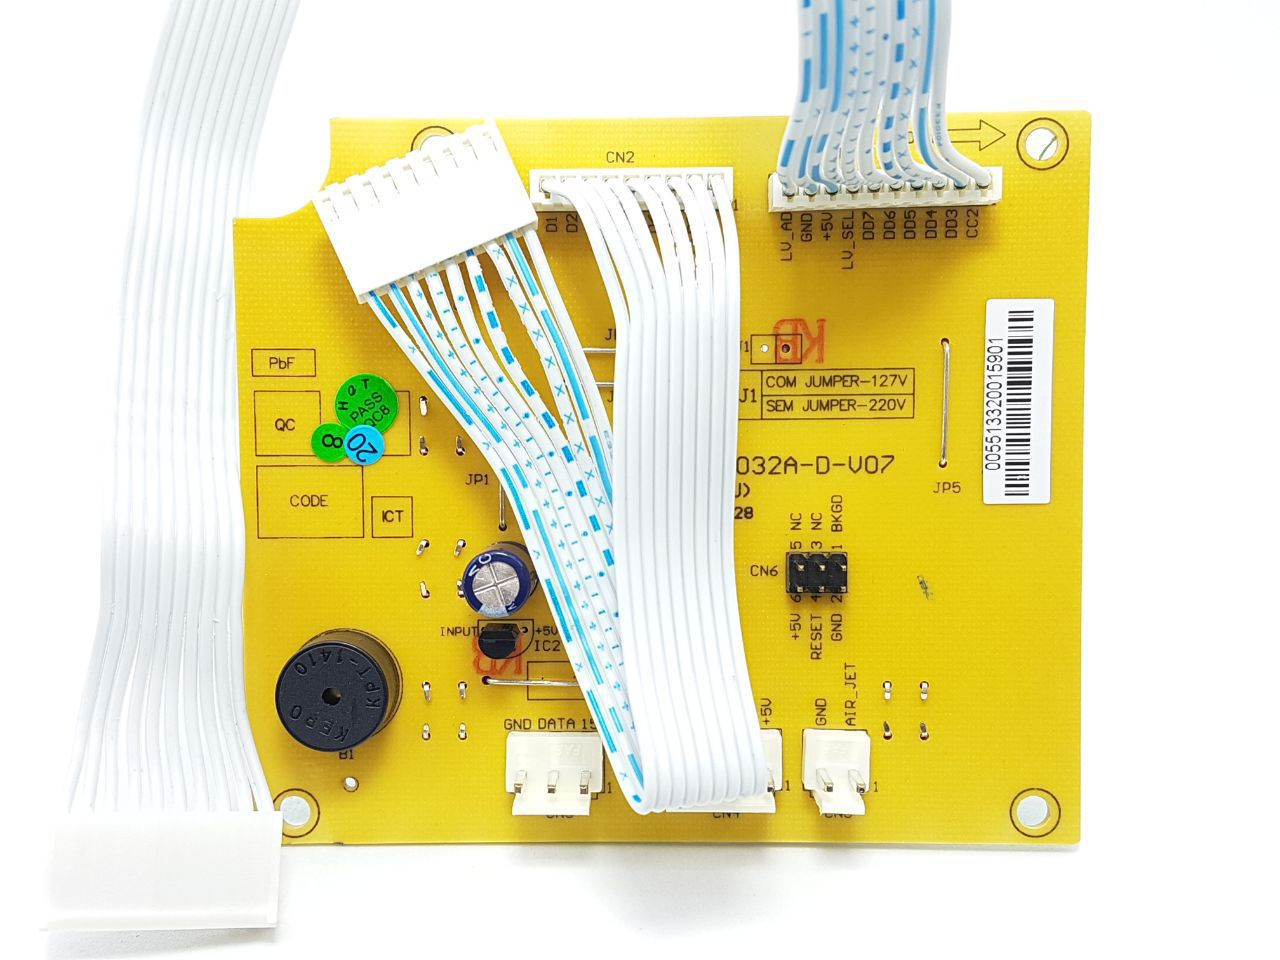 Placa Interface Lavadora Electrolux Lta15 - 64800260